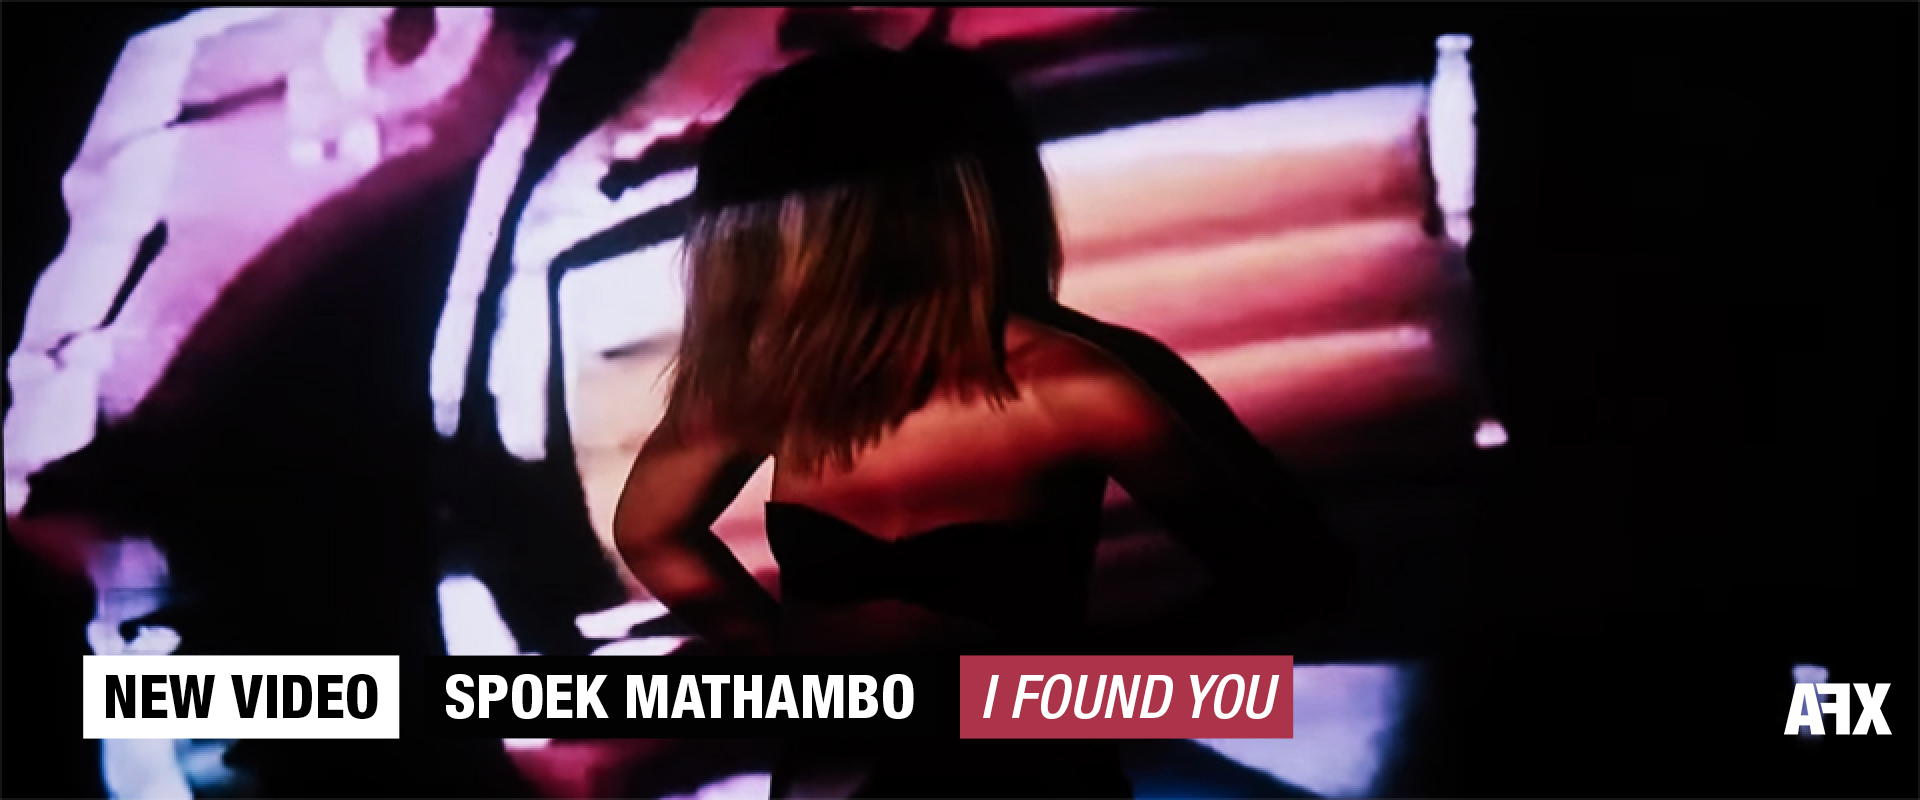 SPOEK MATHAMBO : NOUVEAU CLIP «I FOUND YOU»